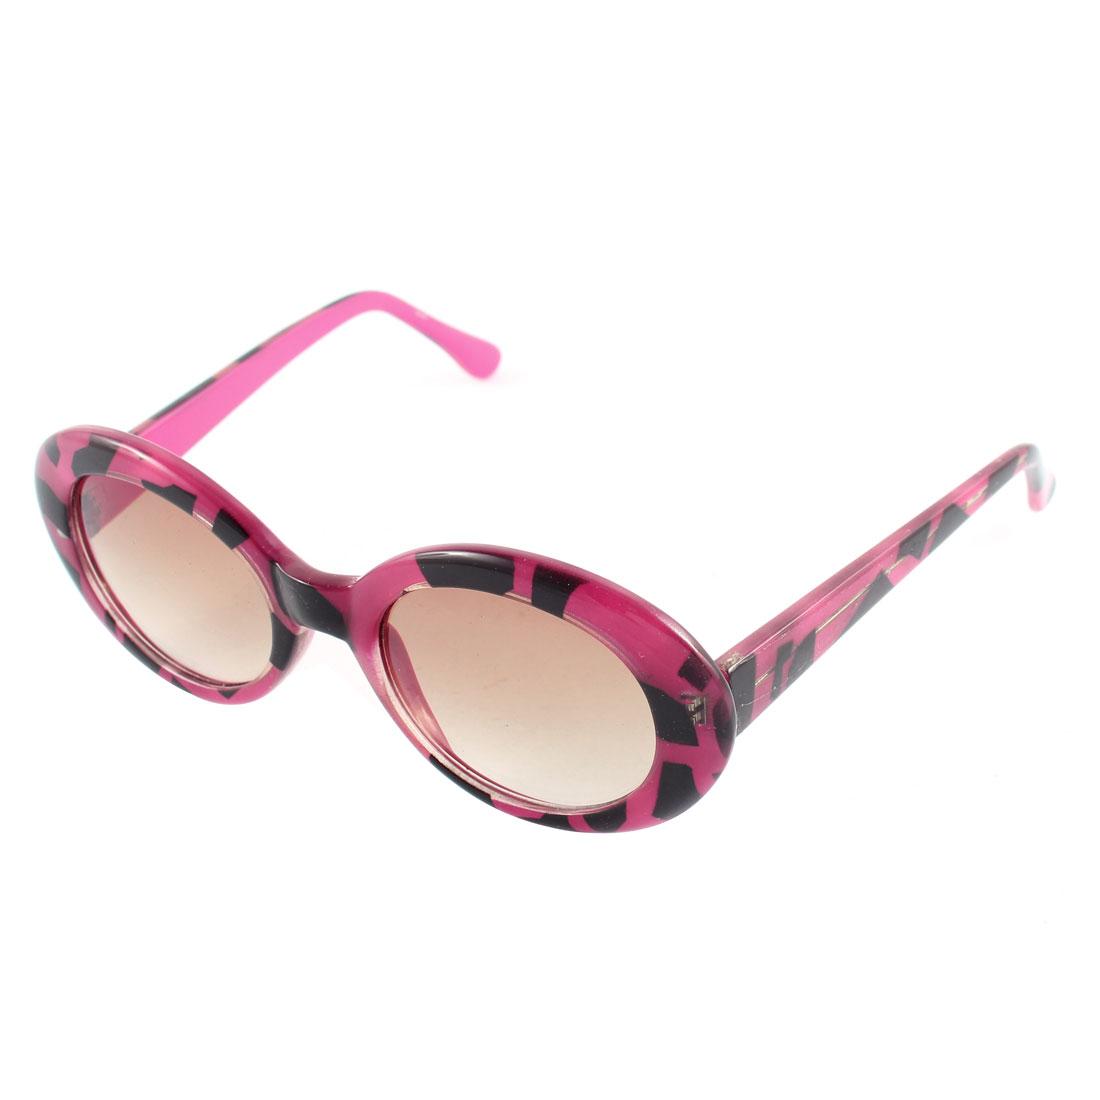 Retro Style Animal Pattern Full Rim Sunglasses Eyeglass Eyewear Purple Black